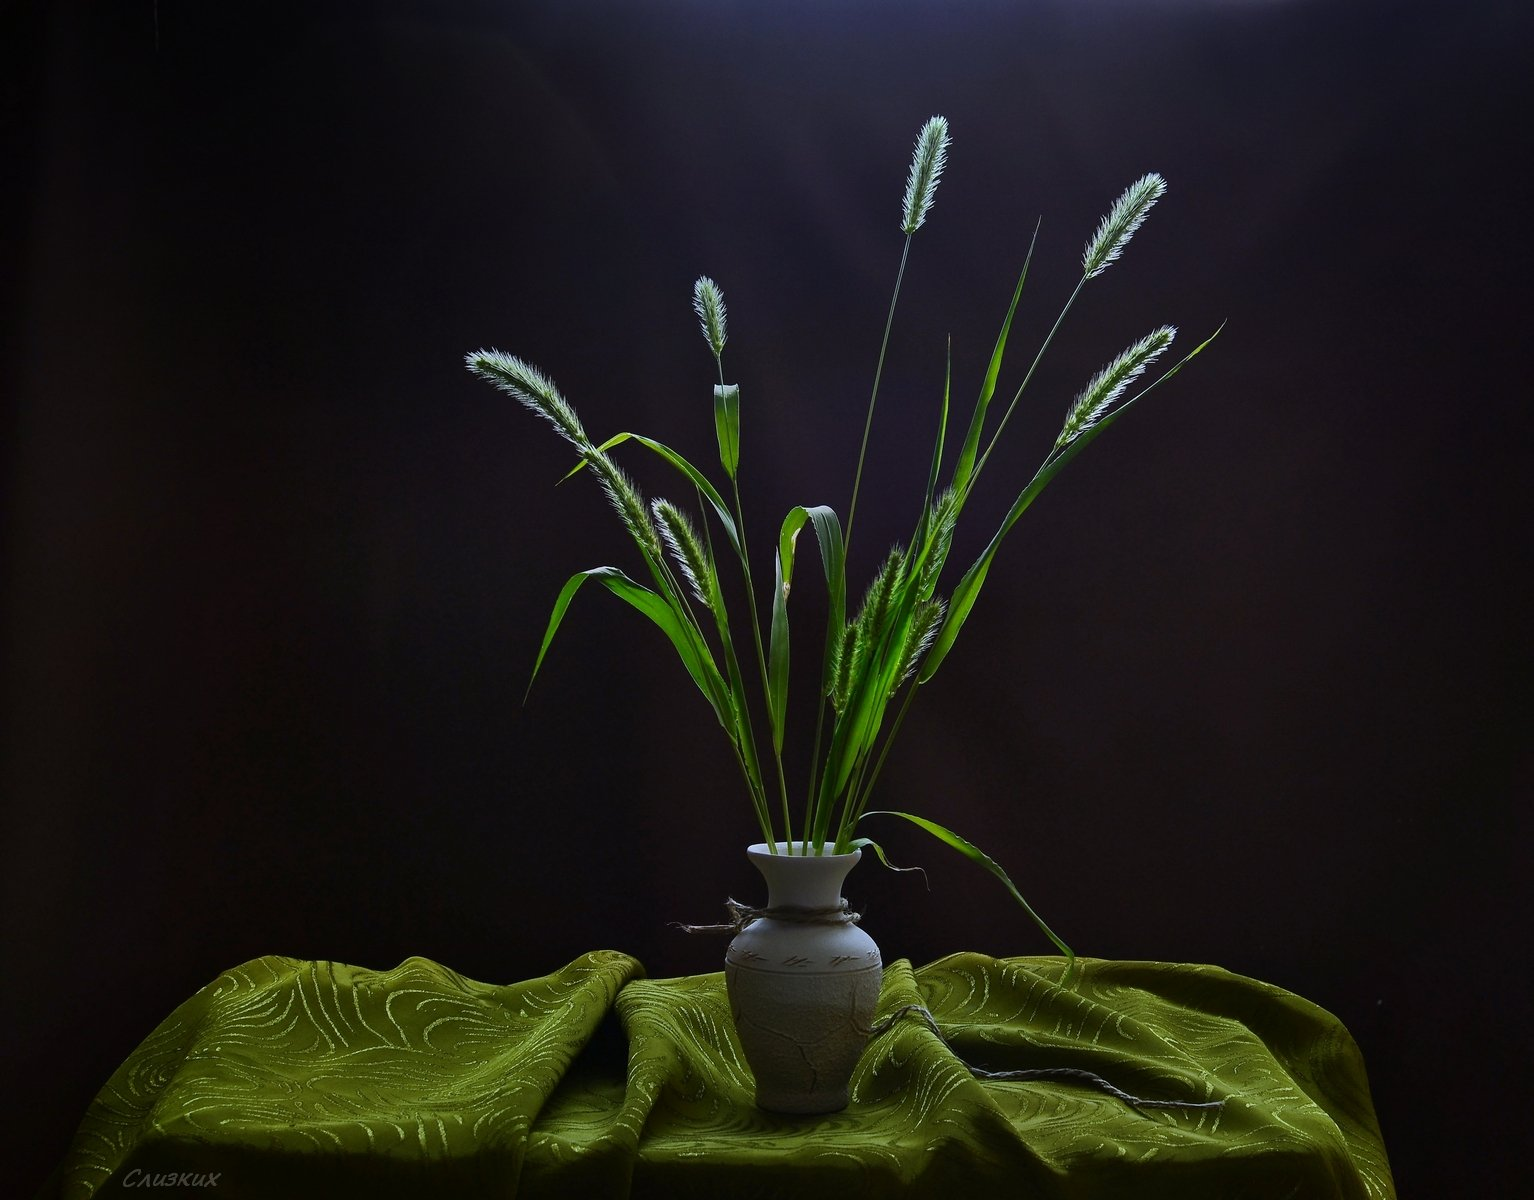 натюрморт,букет,свет,лето,ваза,трава, Инаида